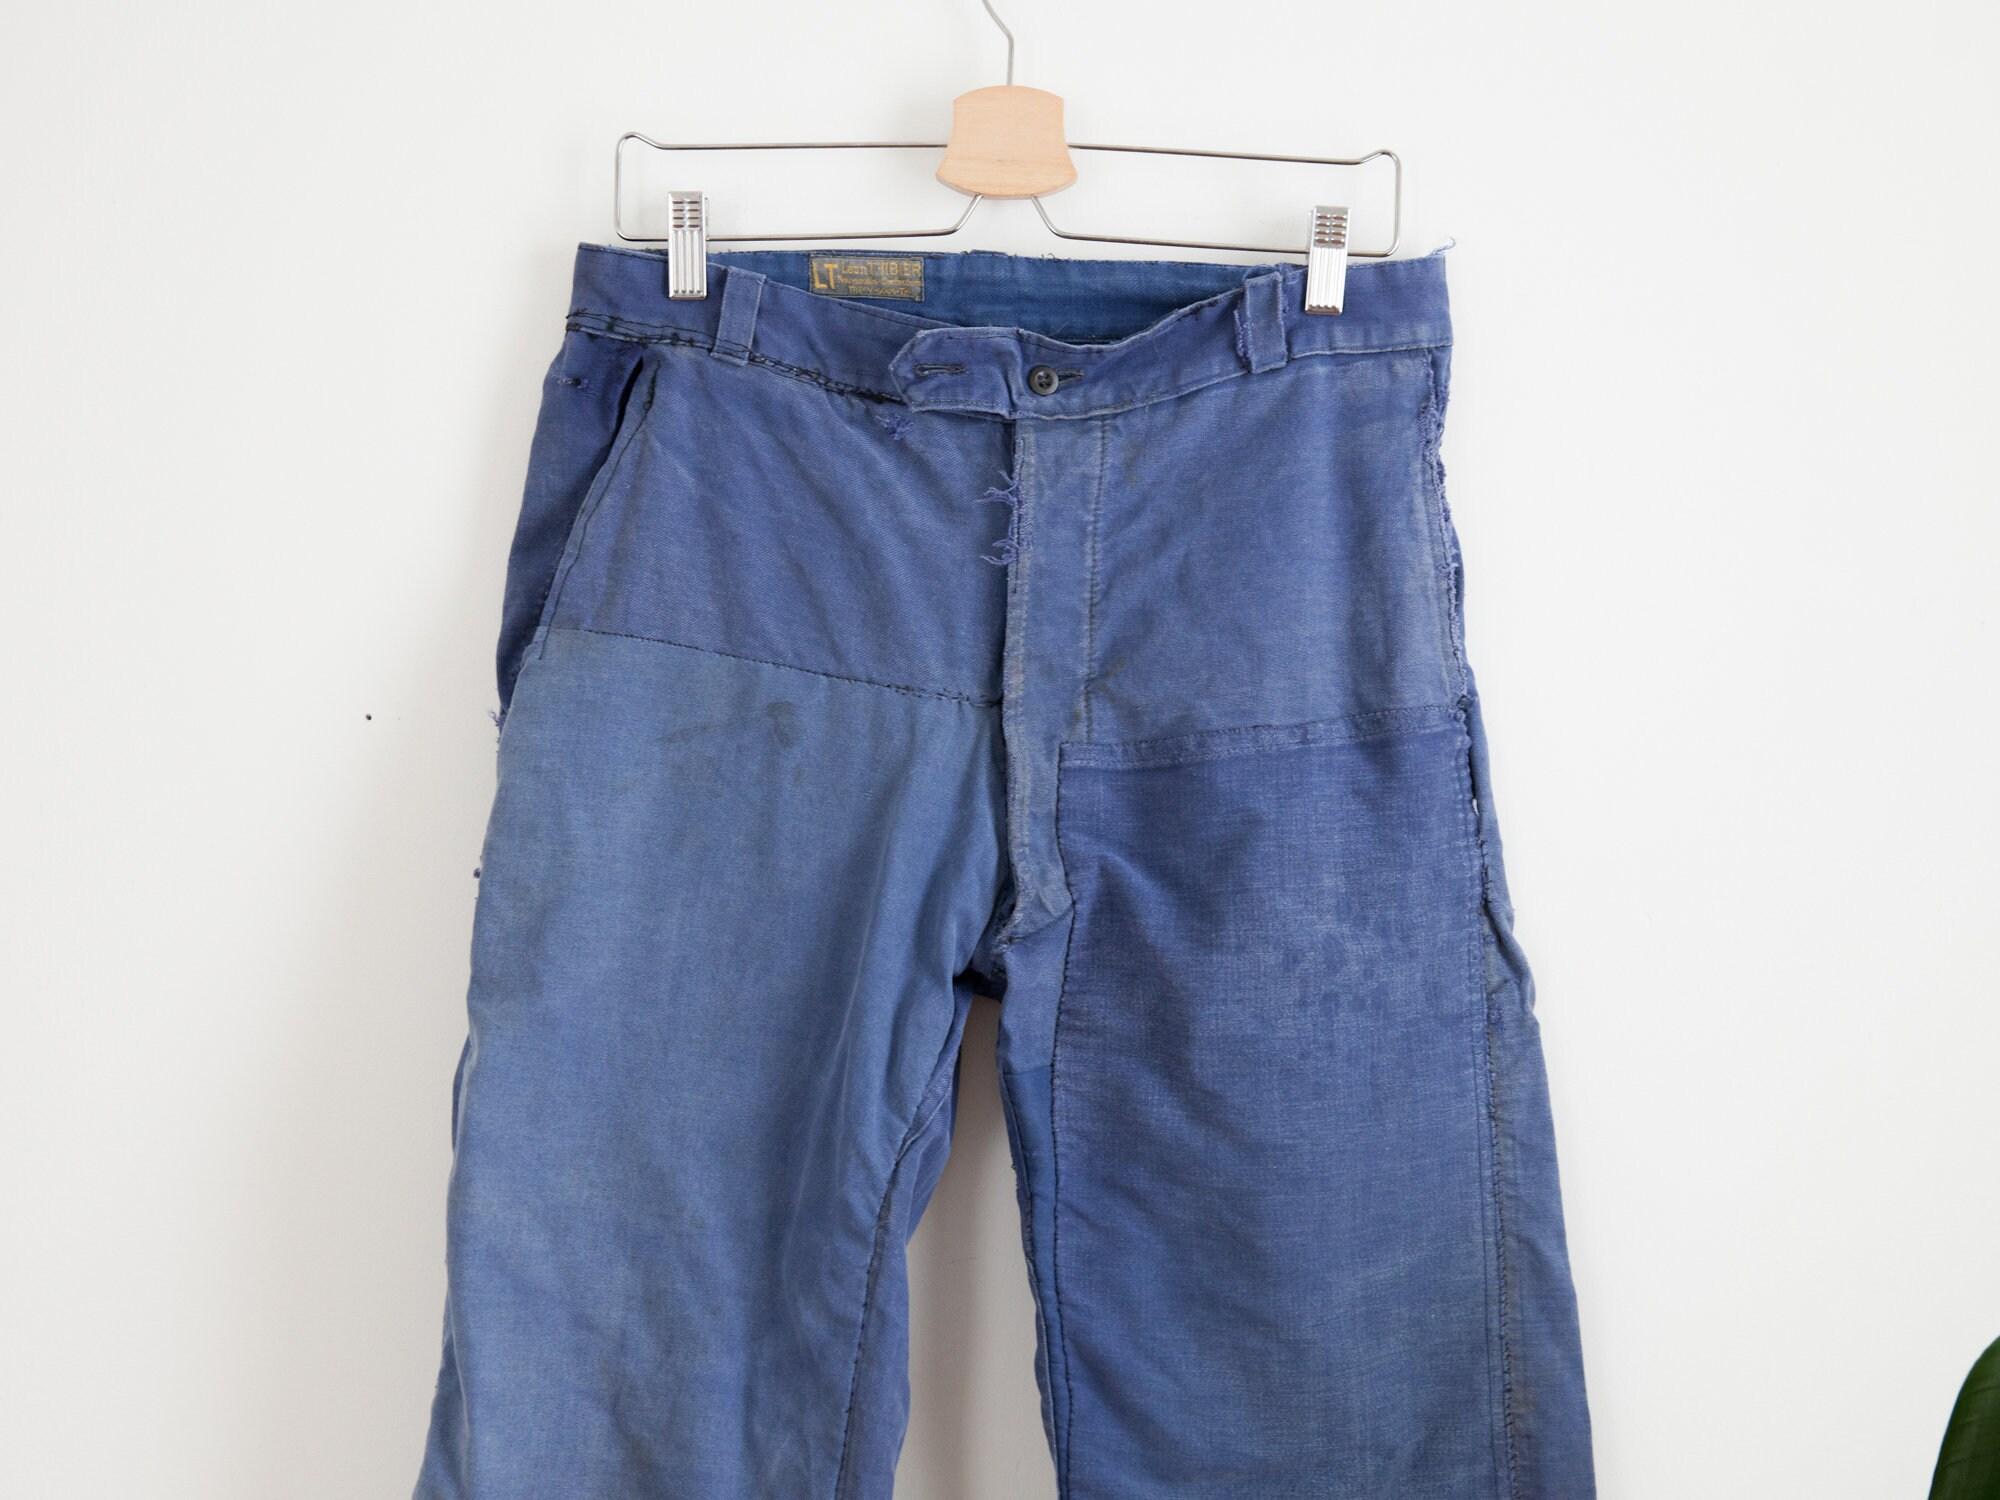 1960s – 70s Men's Ties | Skinny Ties, Slim Ties Waist 31 Men1950S 1960S Vintage French Faded Blue Moleskin Chore Cargo Pants Work Trousers De Travail $0.00 AT vintagedancer.com